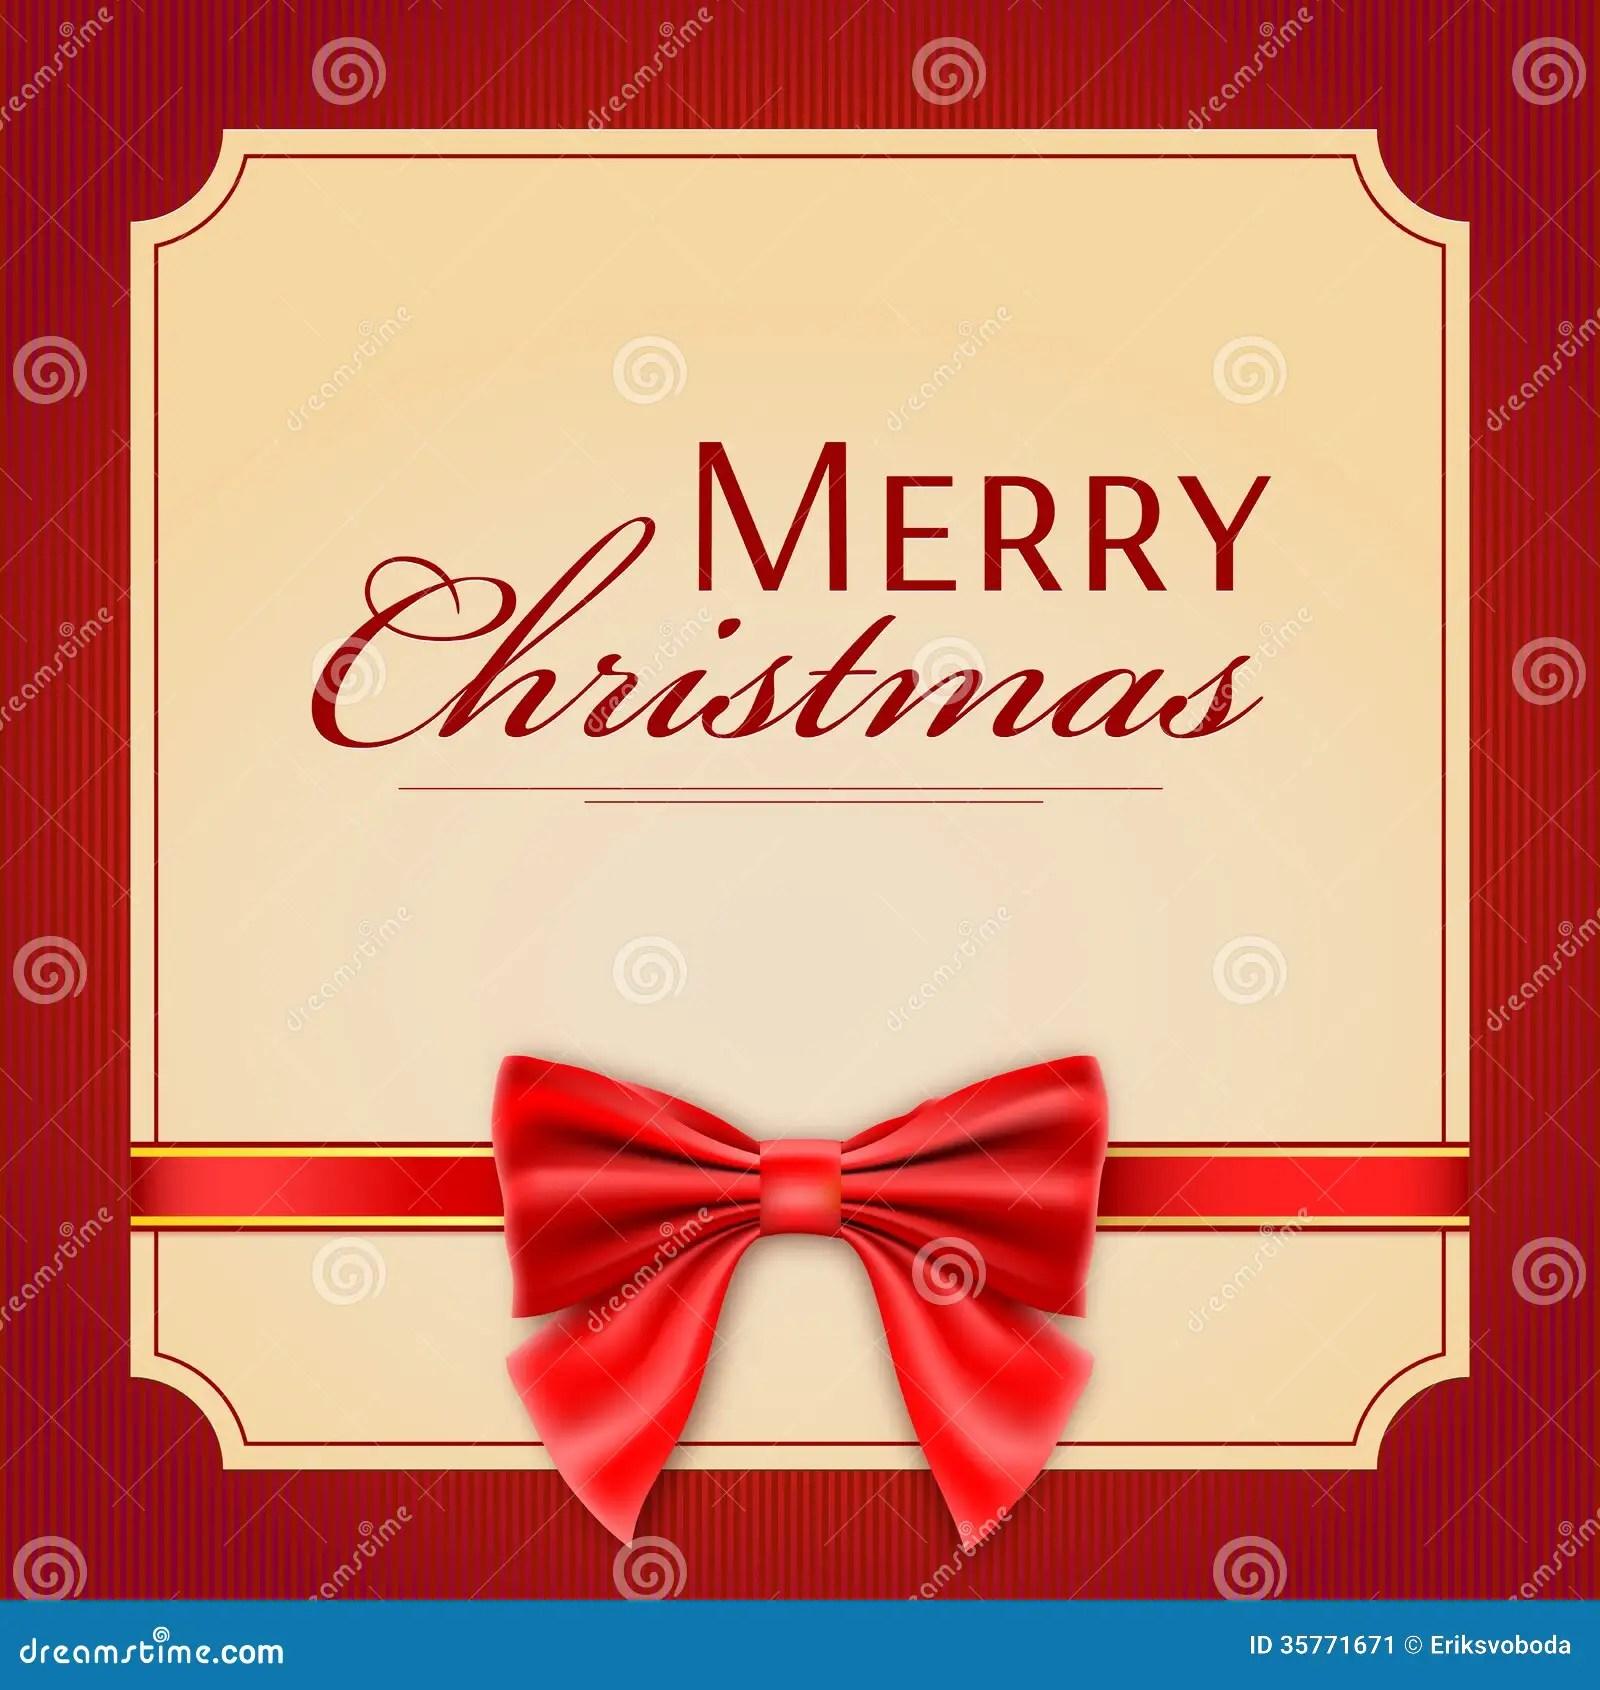 Merry Christmas Stock Image Image 35771671